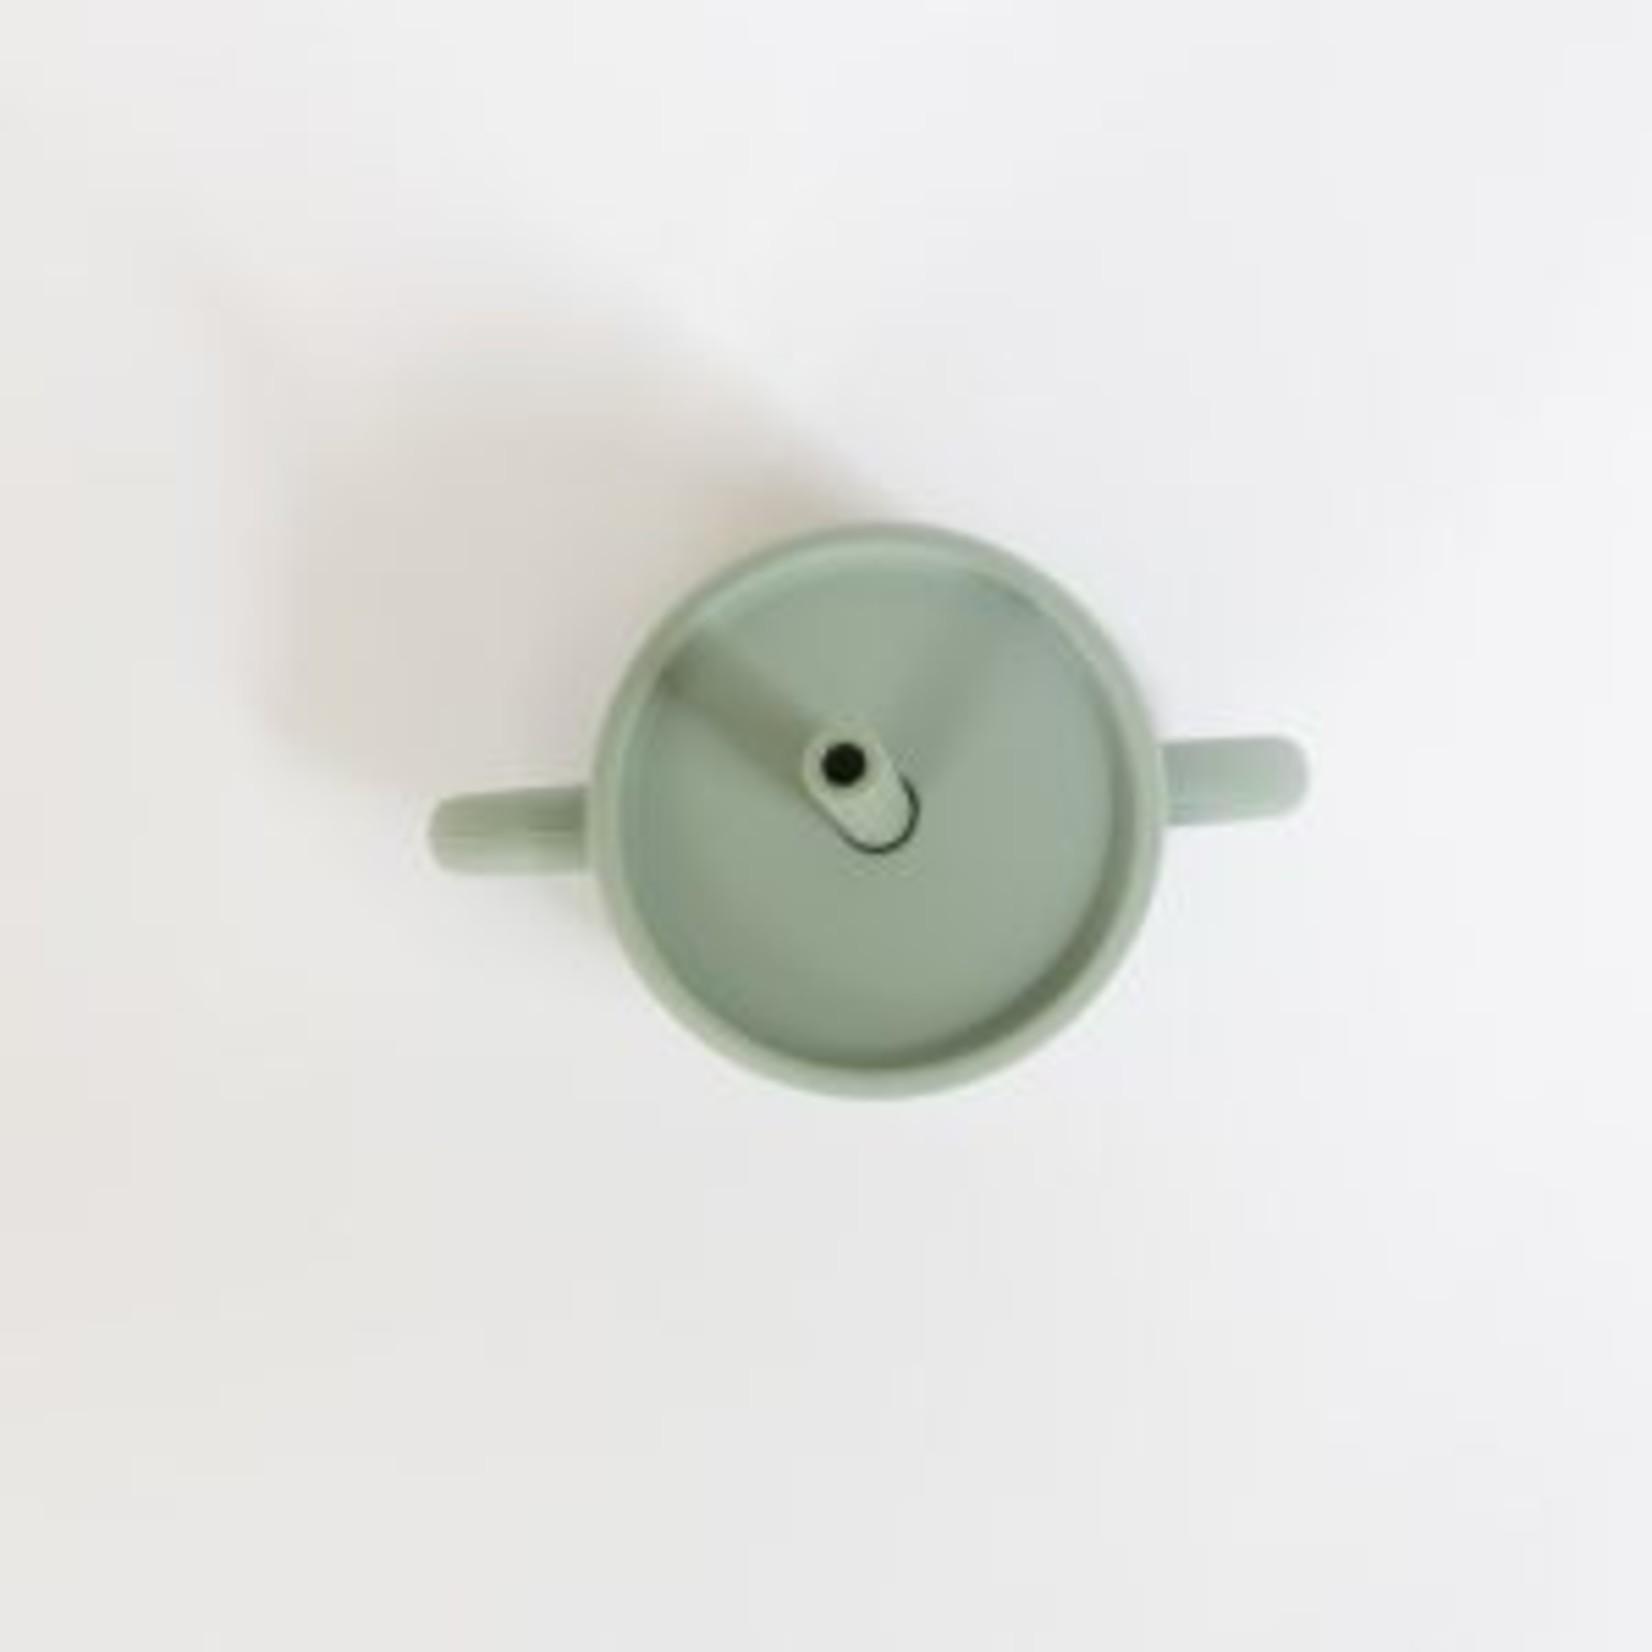 Pois & Moi || Gobelet avec paille Sauge